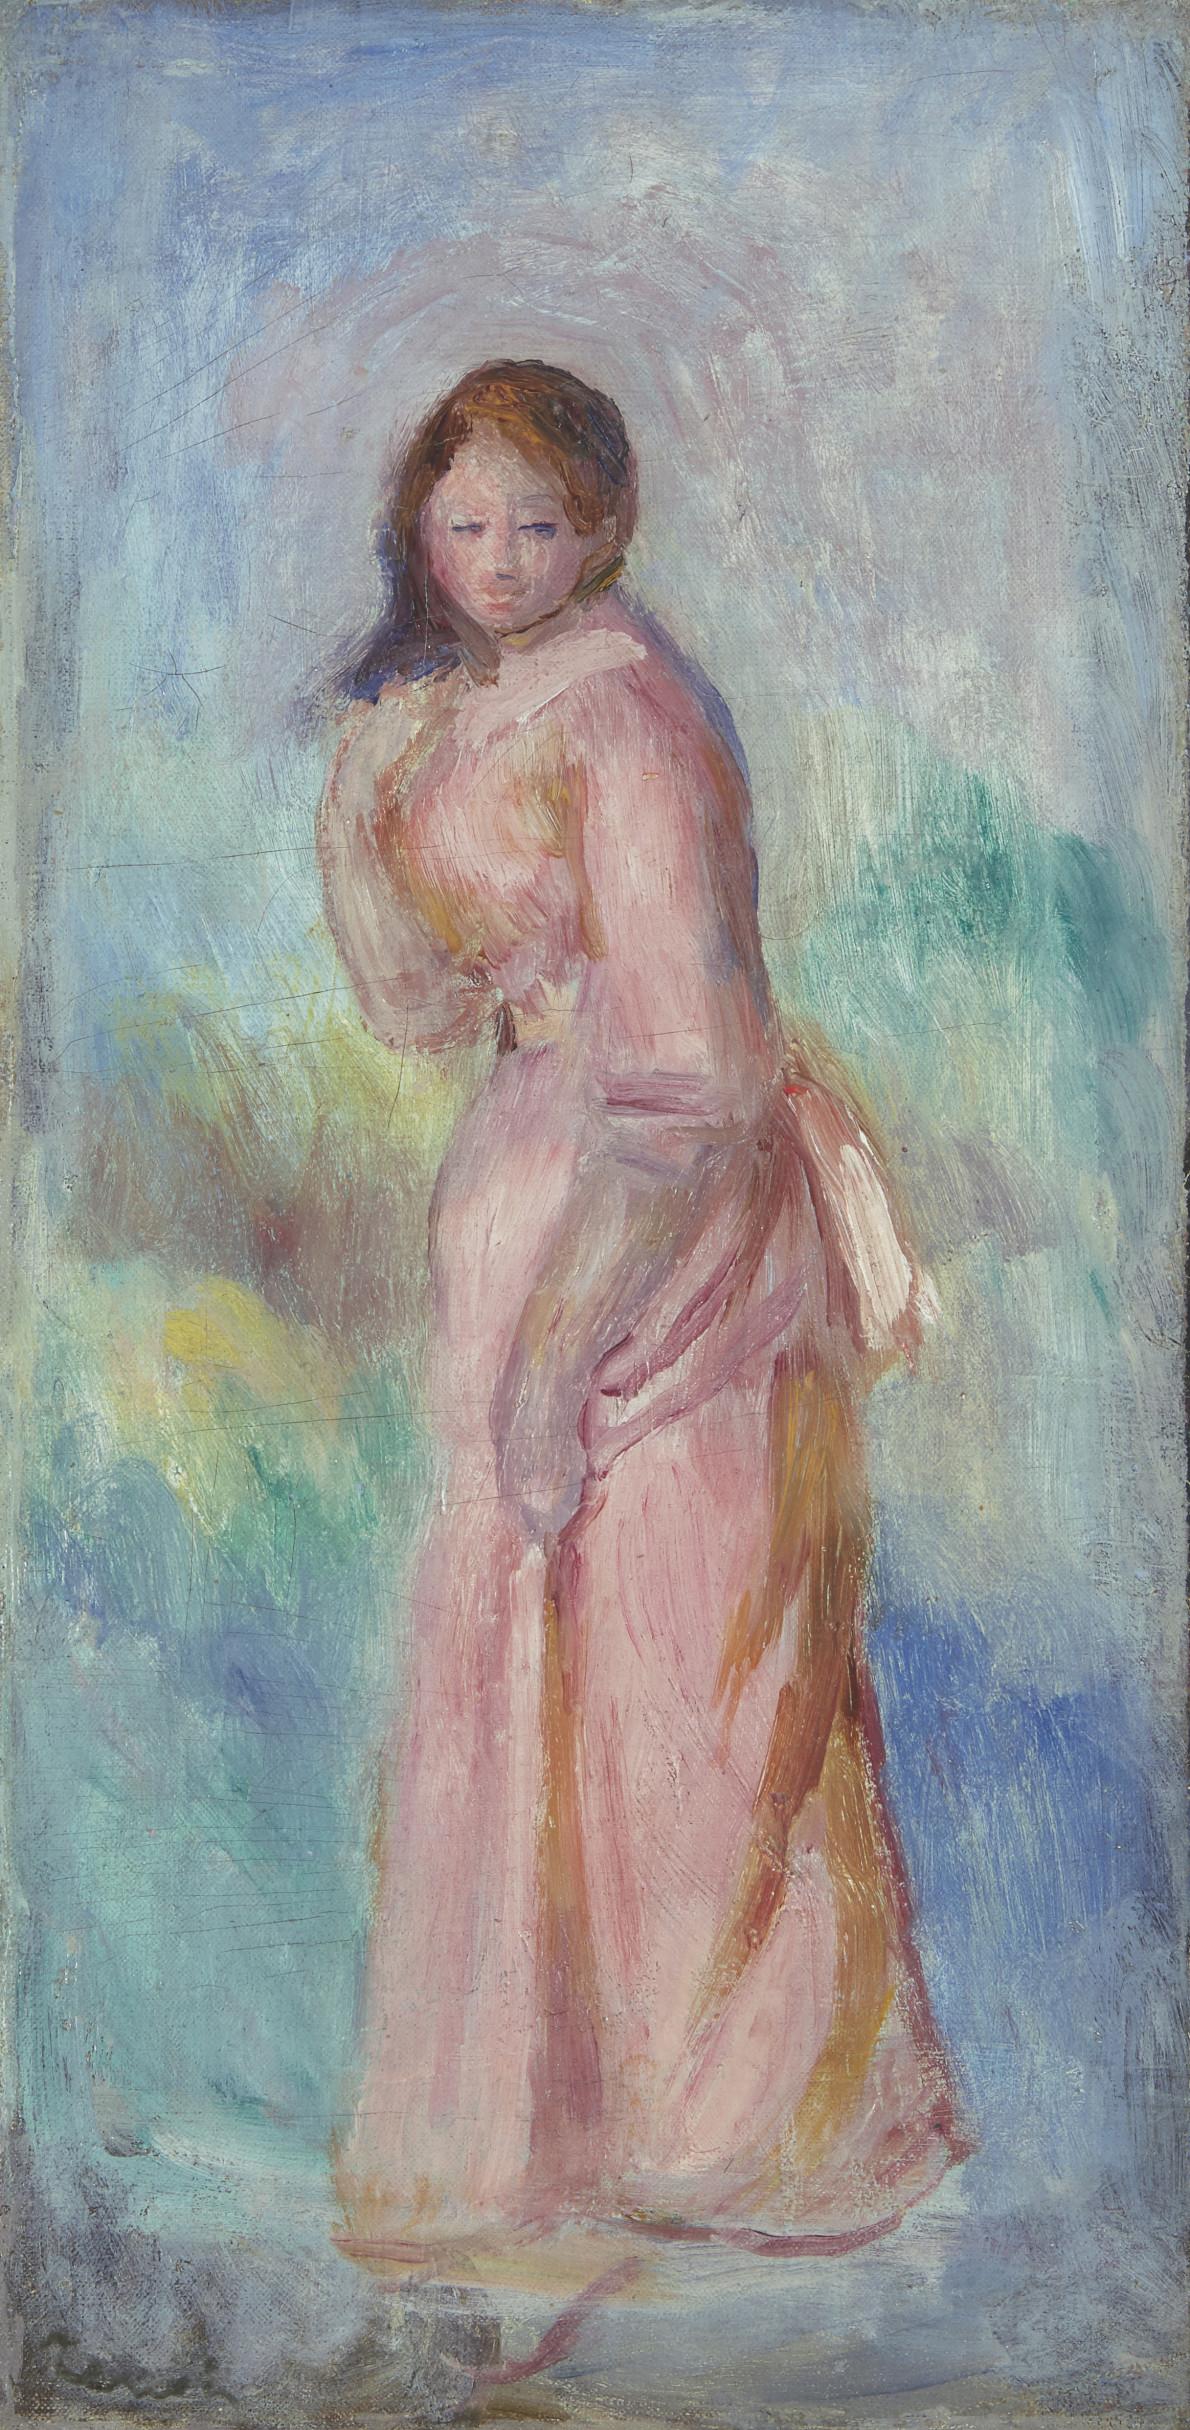 Pierre-Auguste Renoir, Jeune fille en rose, 1900